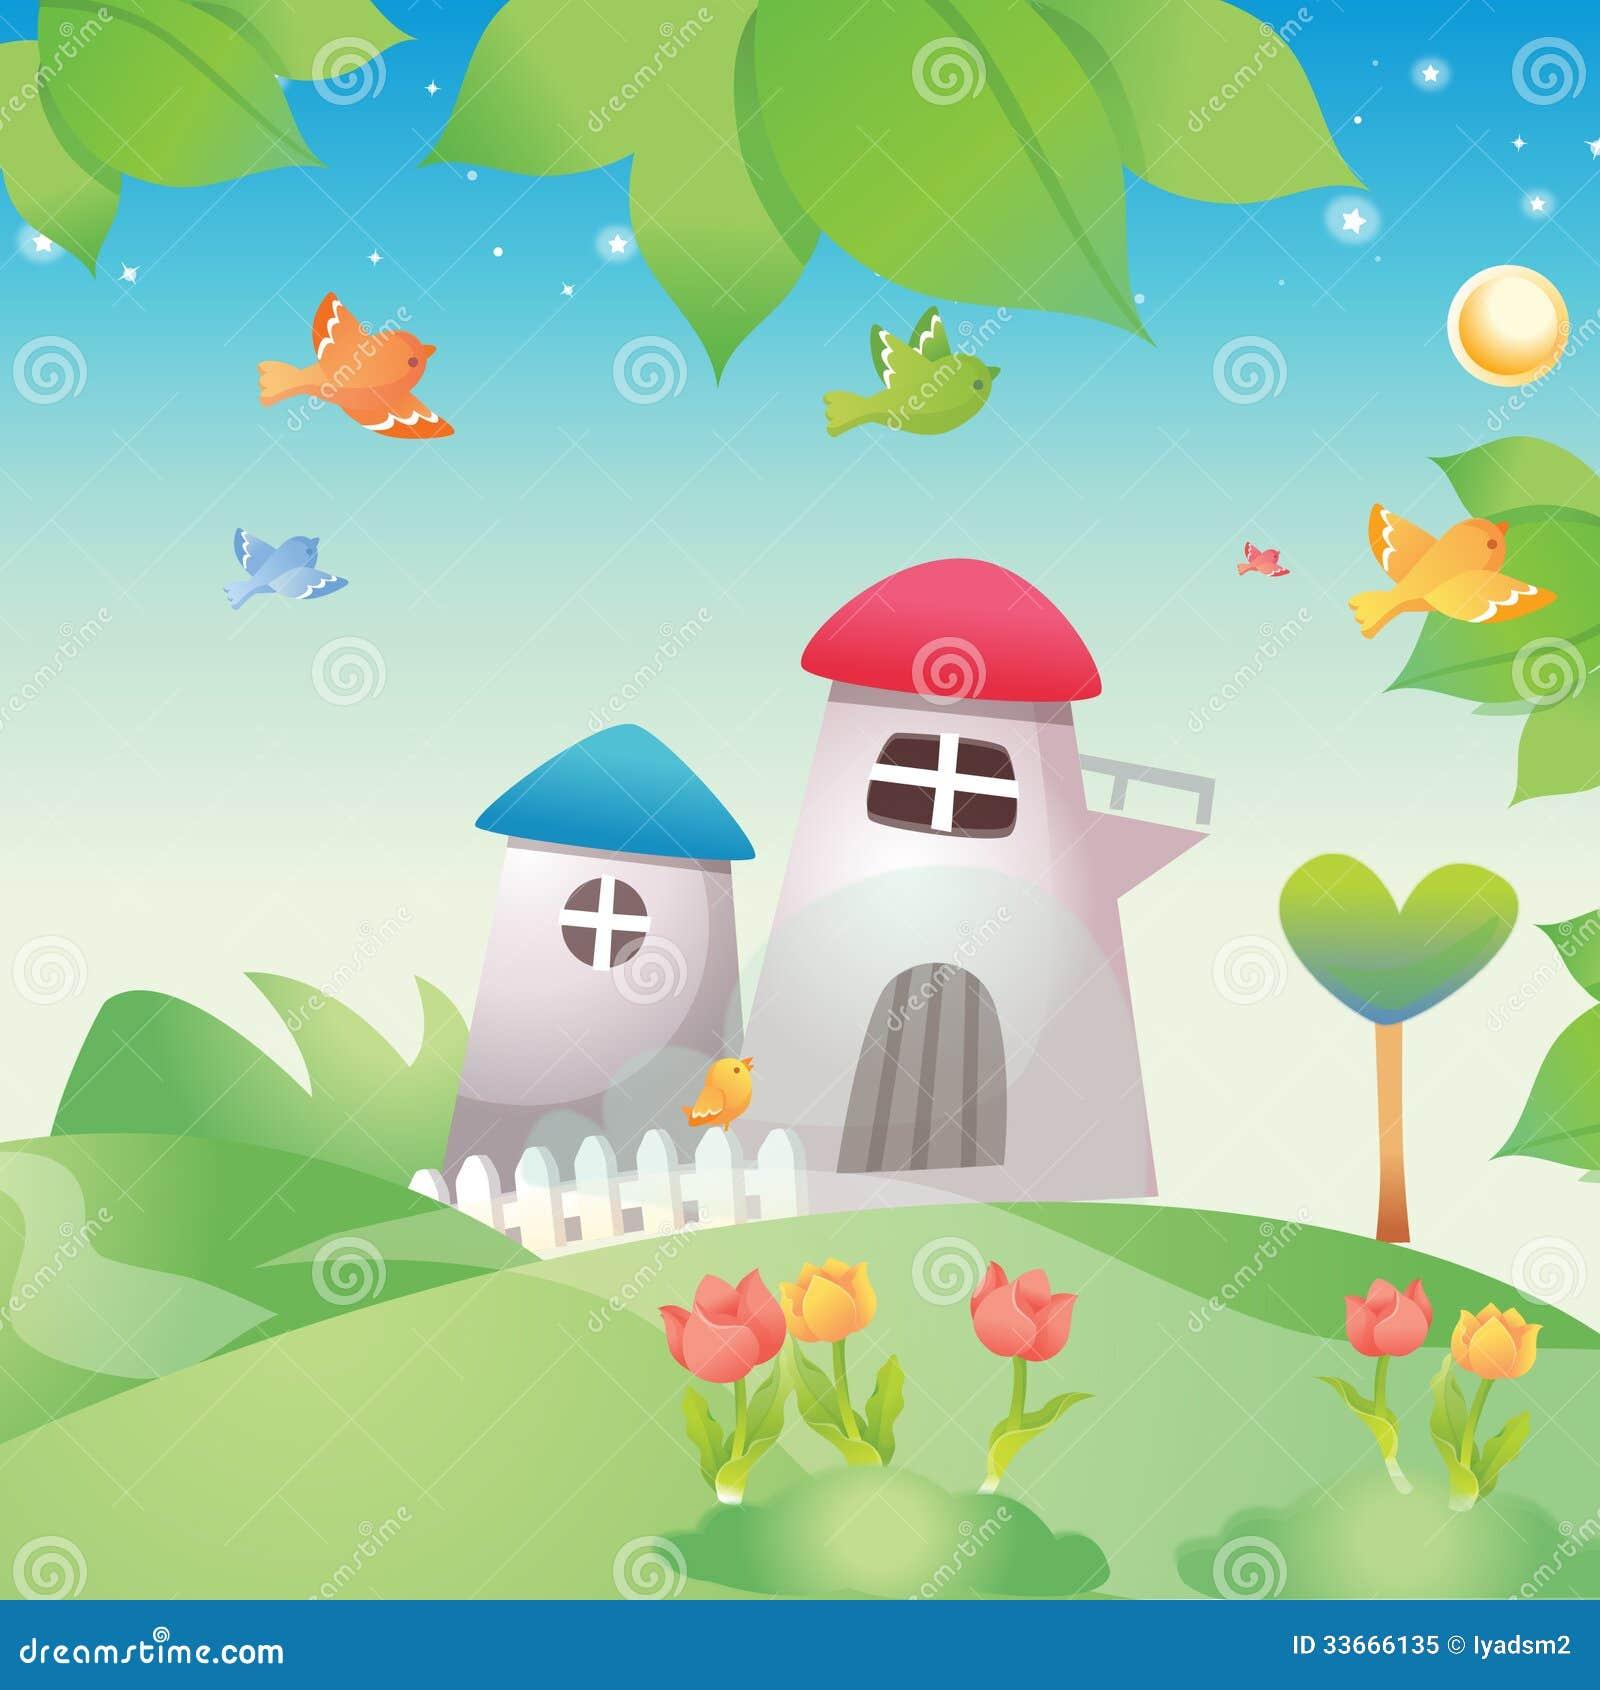 Beautiful garden cartoon - Beautiful Cartoon Garden